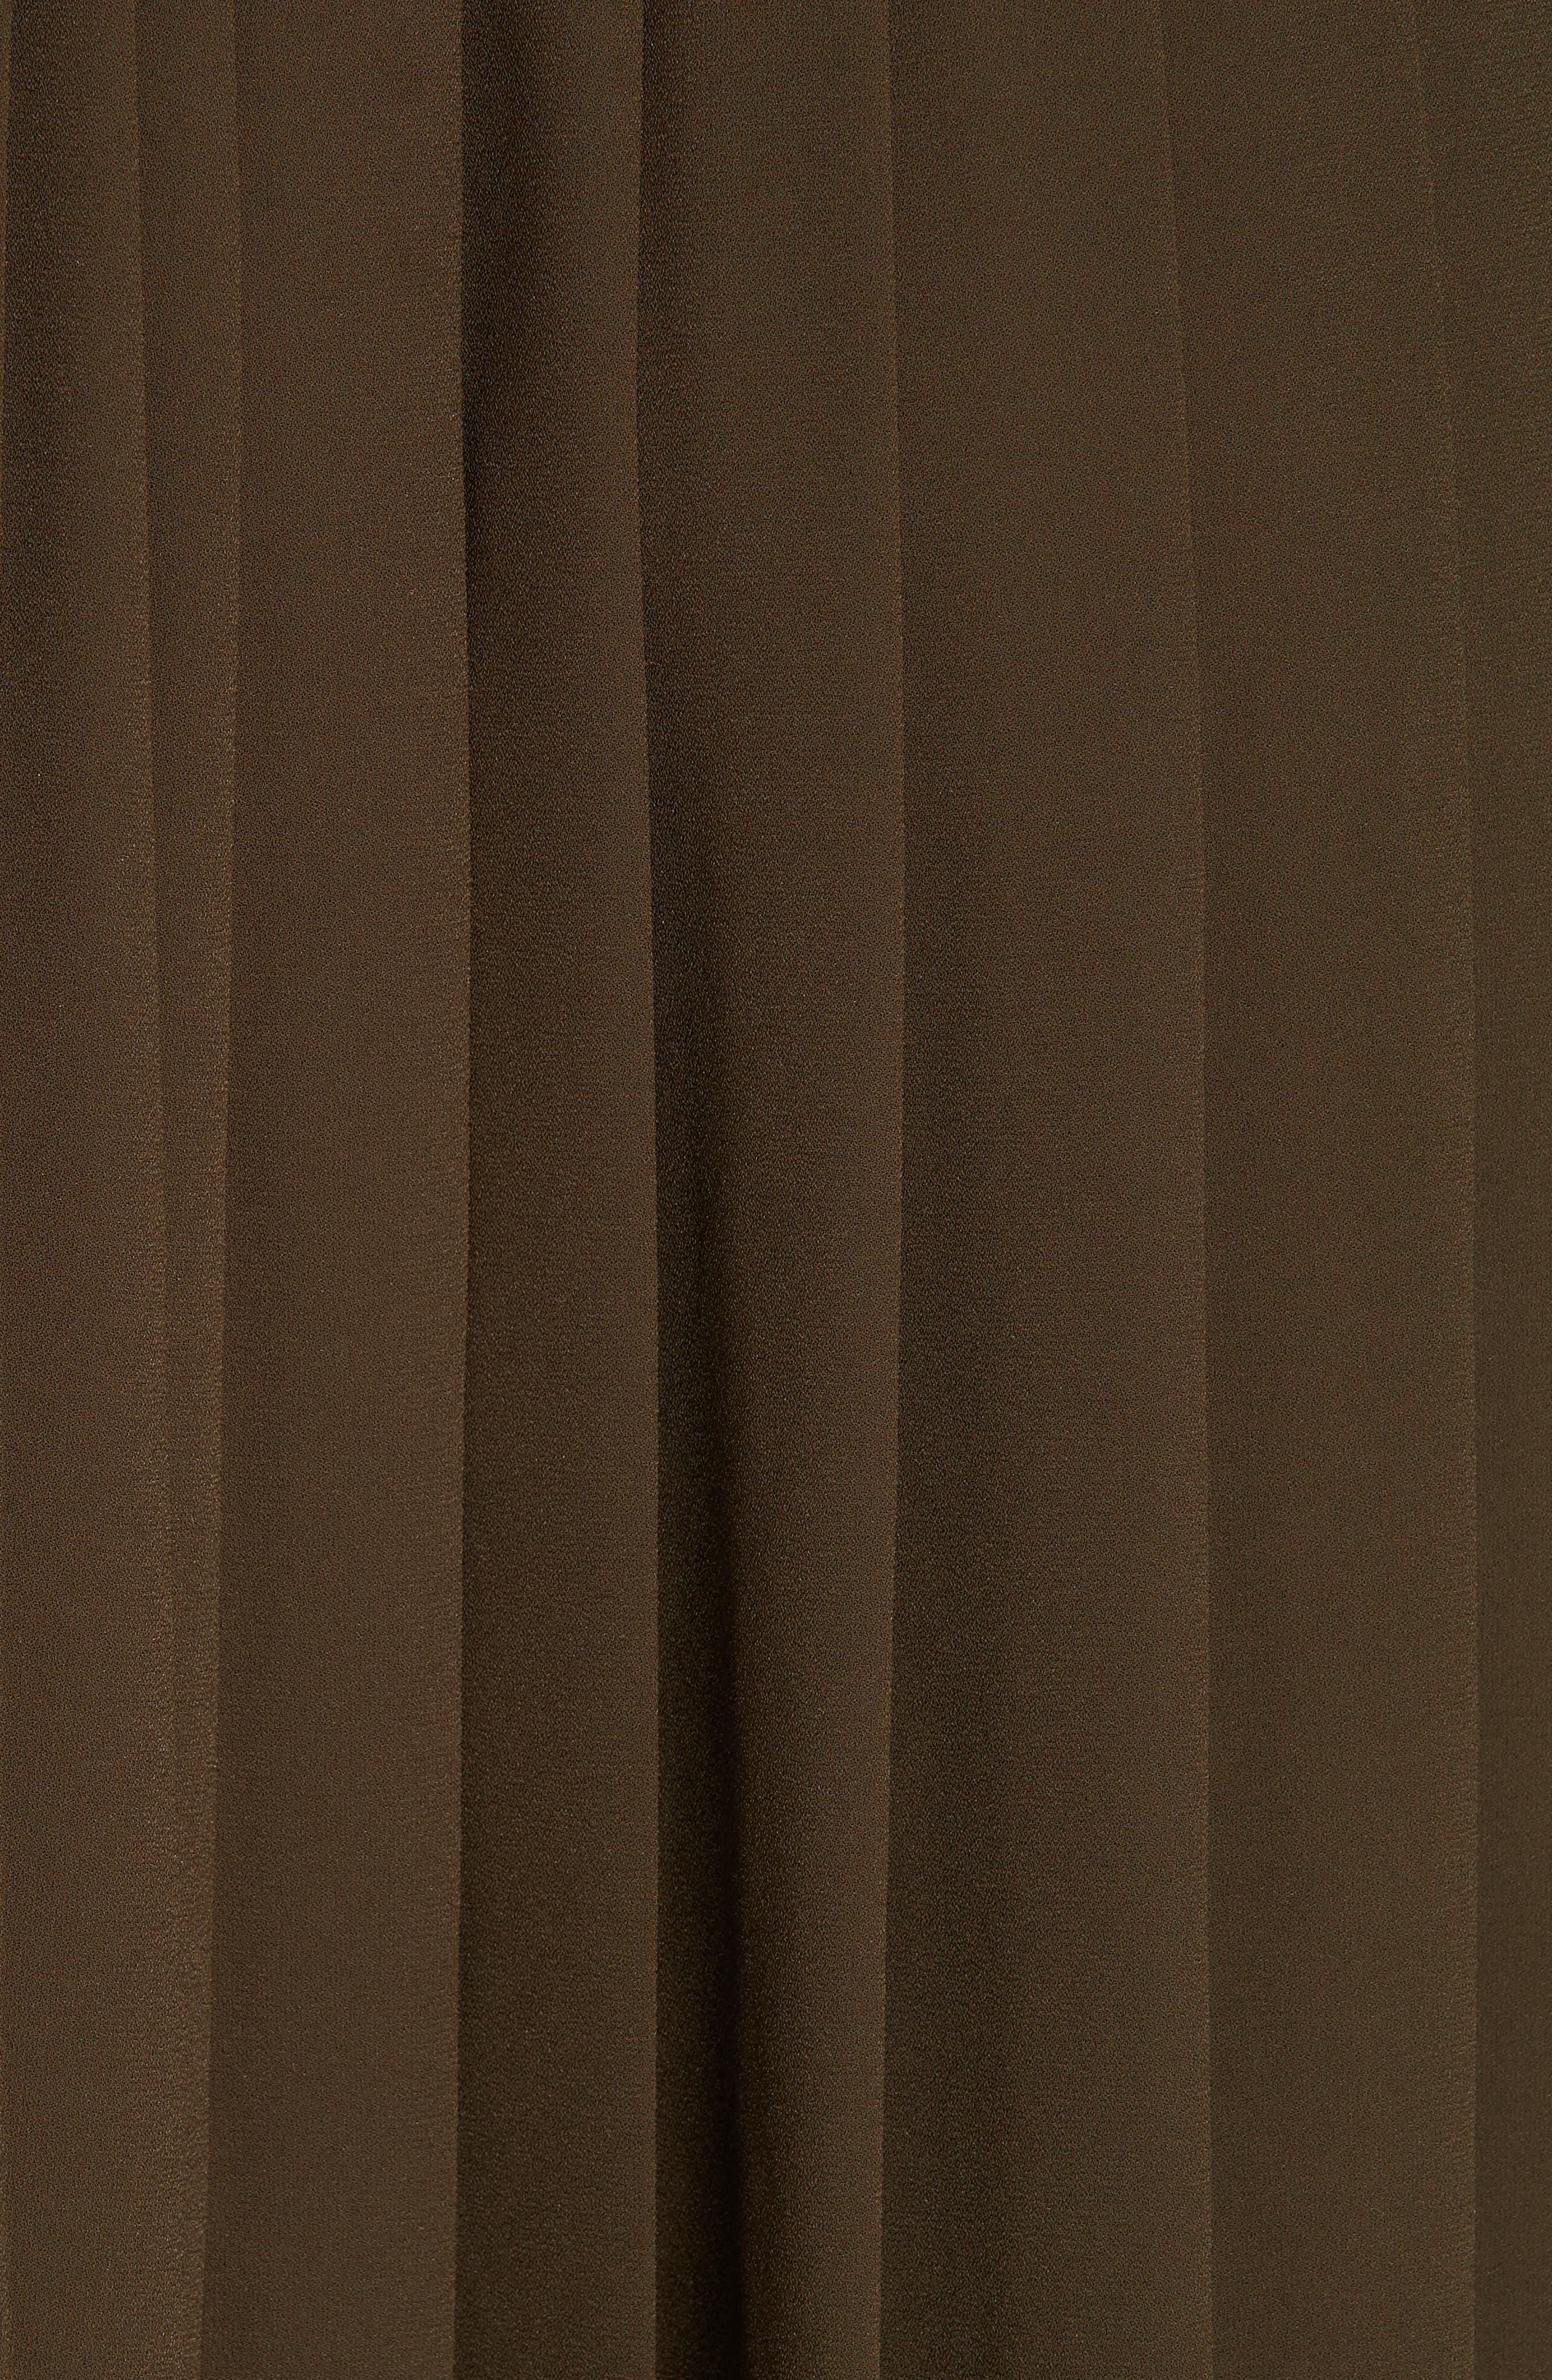 Asymmetrical Pleat A-Line Skirt,                             Alternate thumbnail 5, color,                             OLIVE TUSCAN